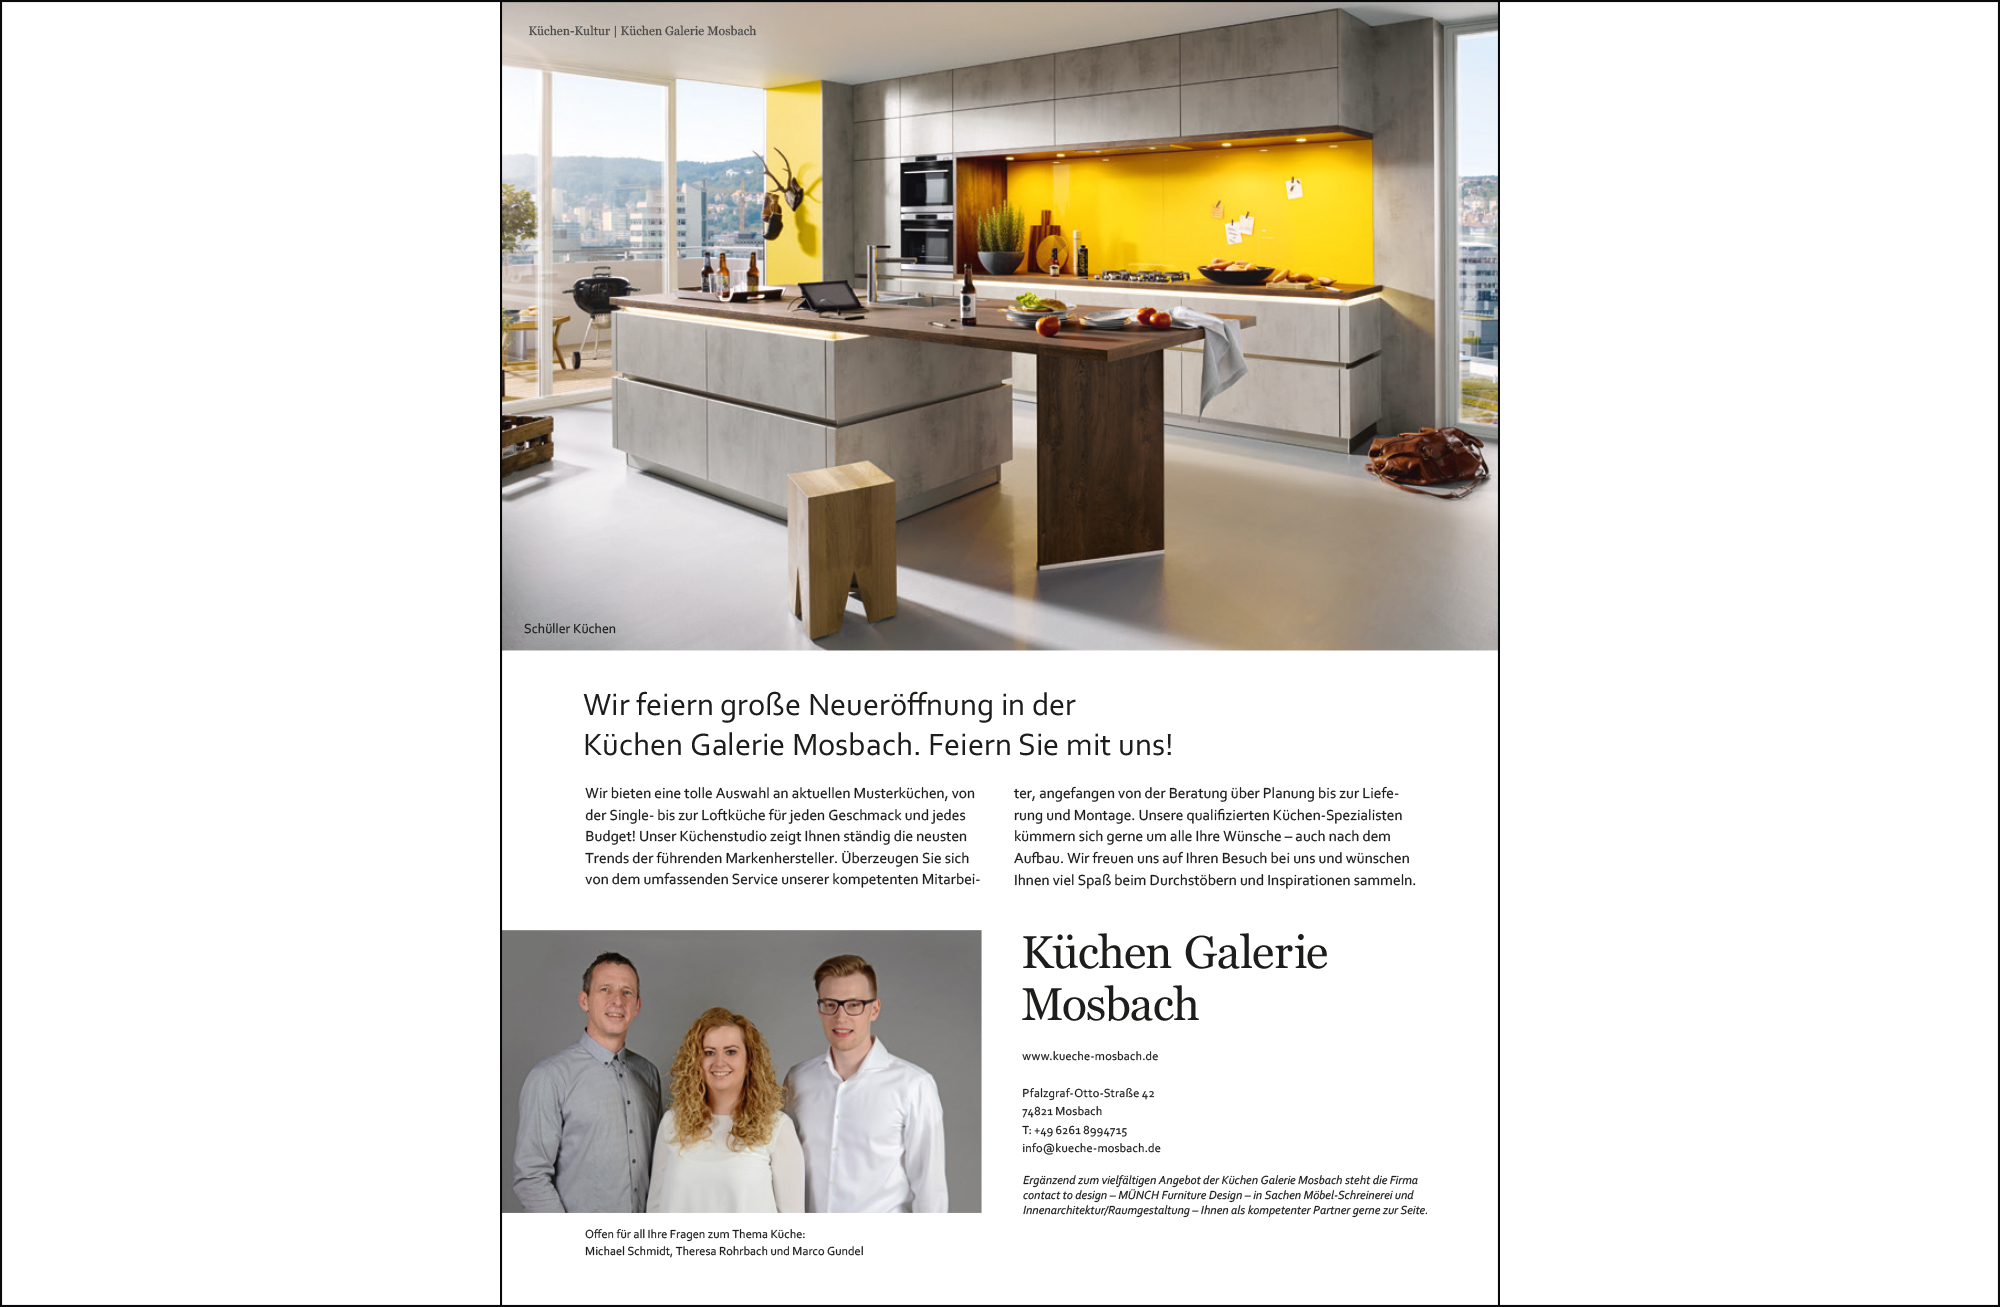 Mannheim Kuchenstudio Spritzschutz Kuche Abnehmbar Wasserhahn